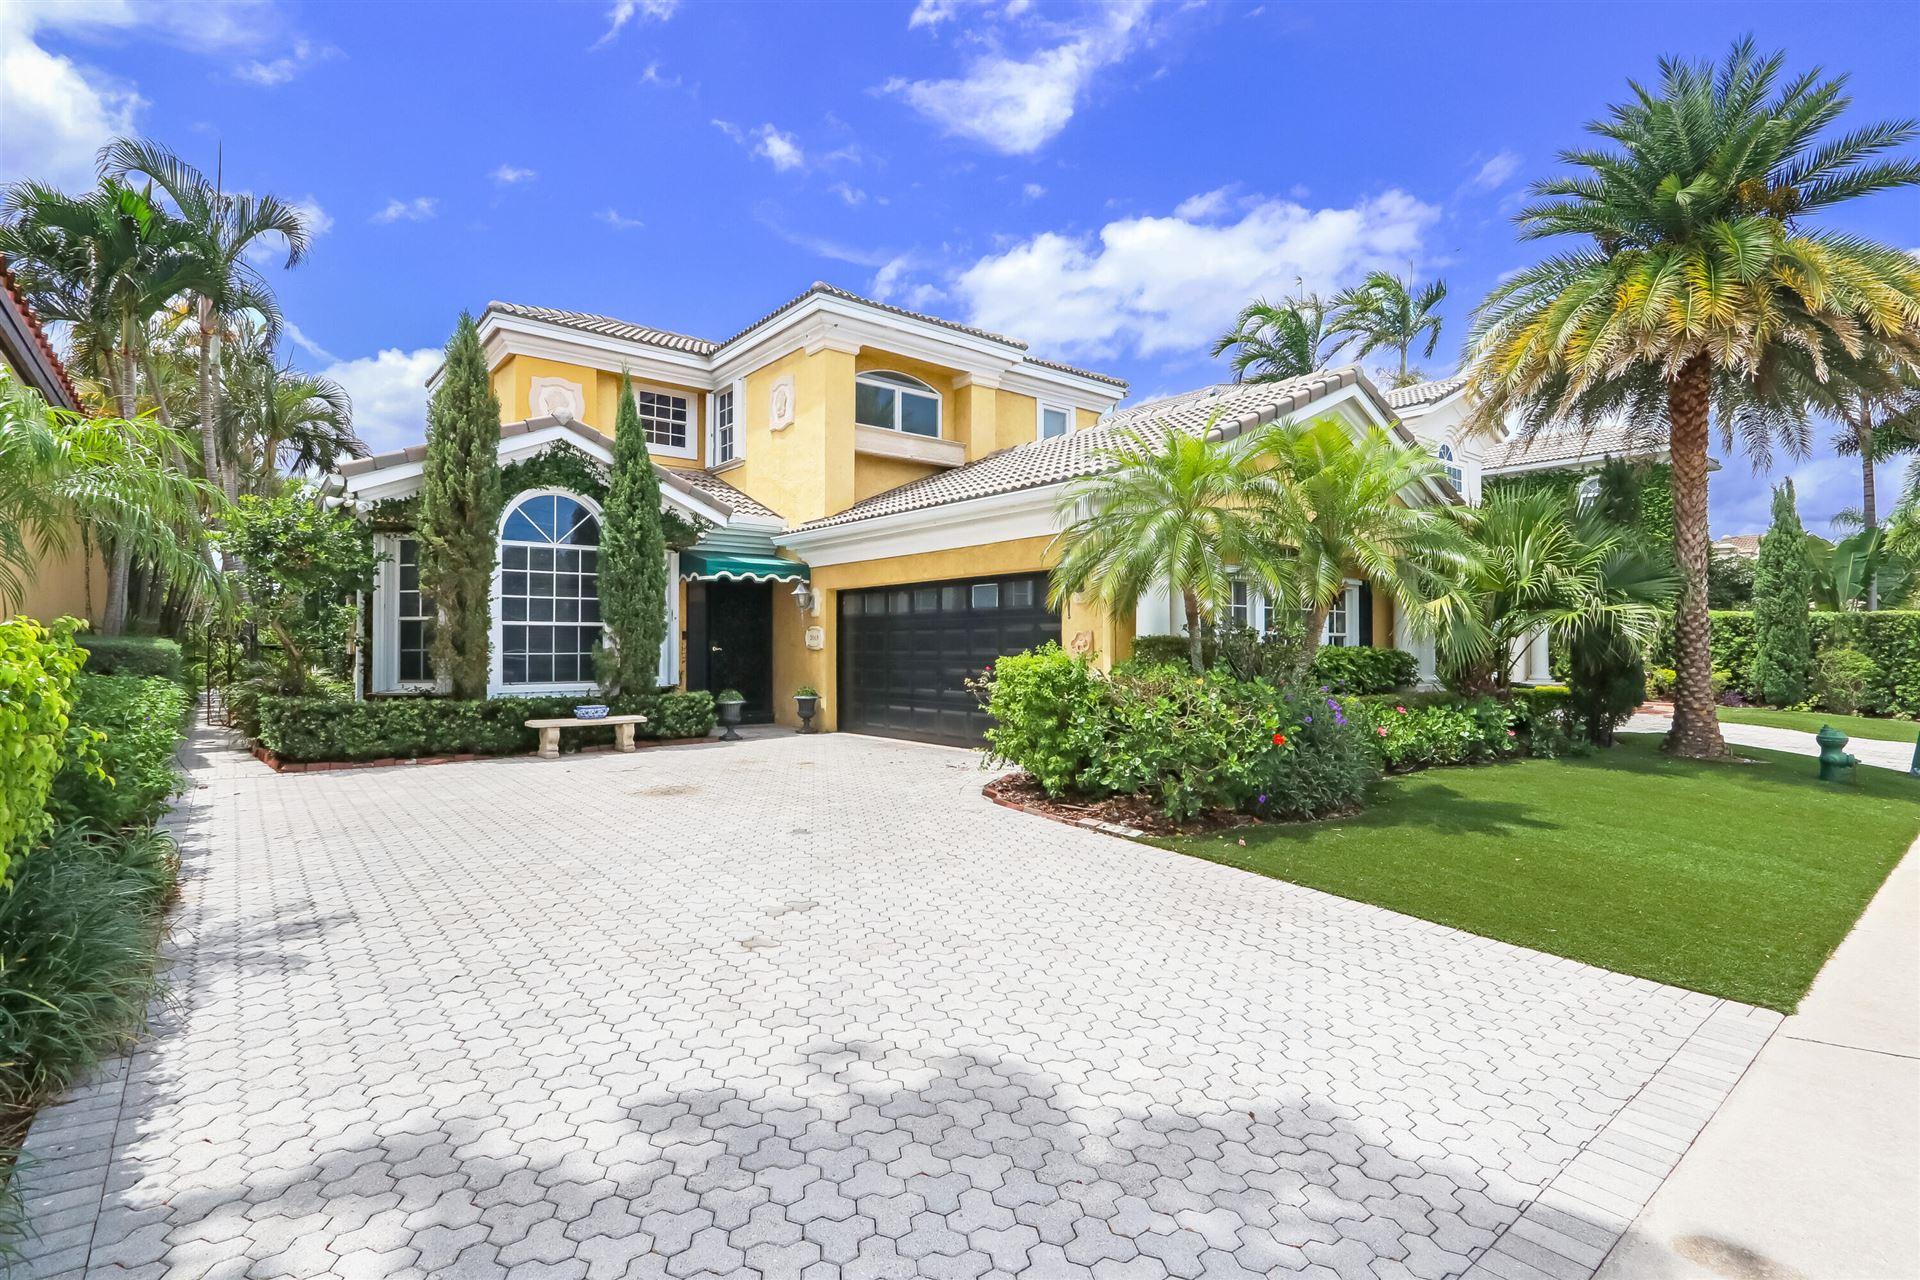 2065 Regents Boulevard, West Palm Beach, FL 33409 - MLS#: RX-10716739